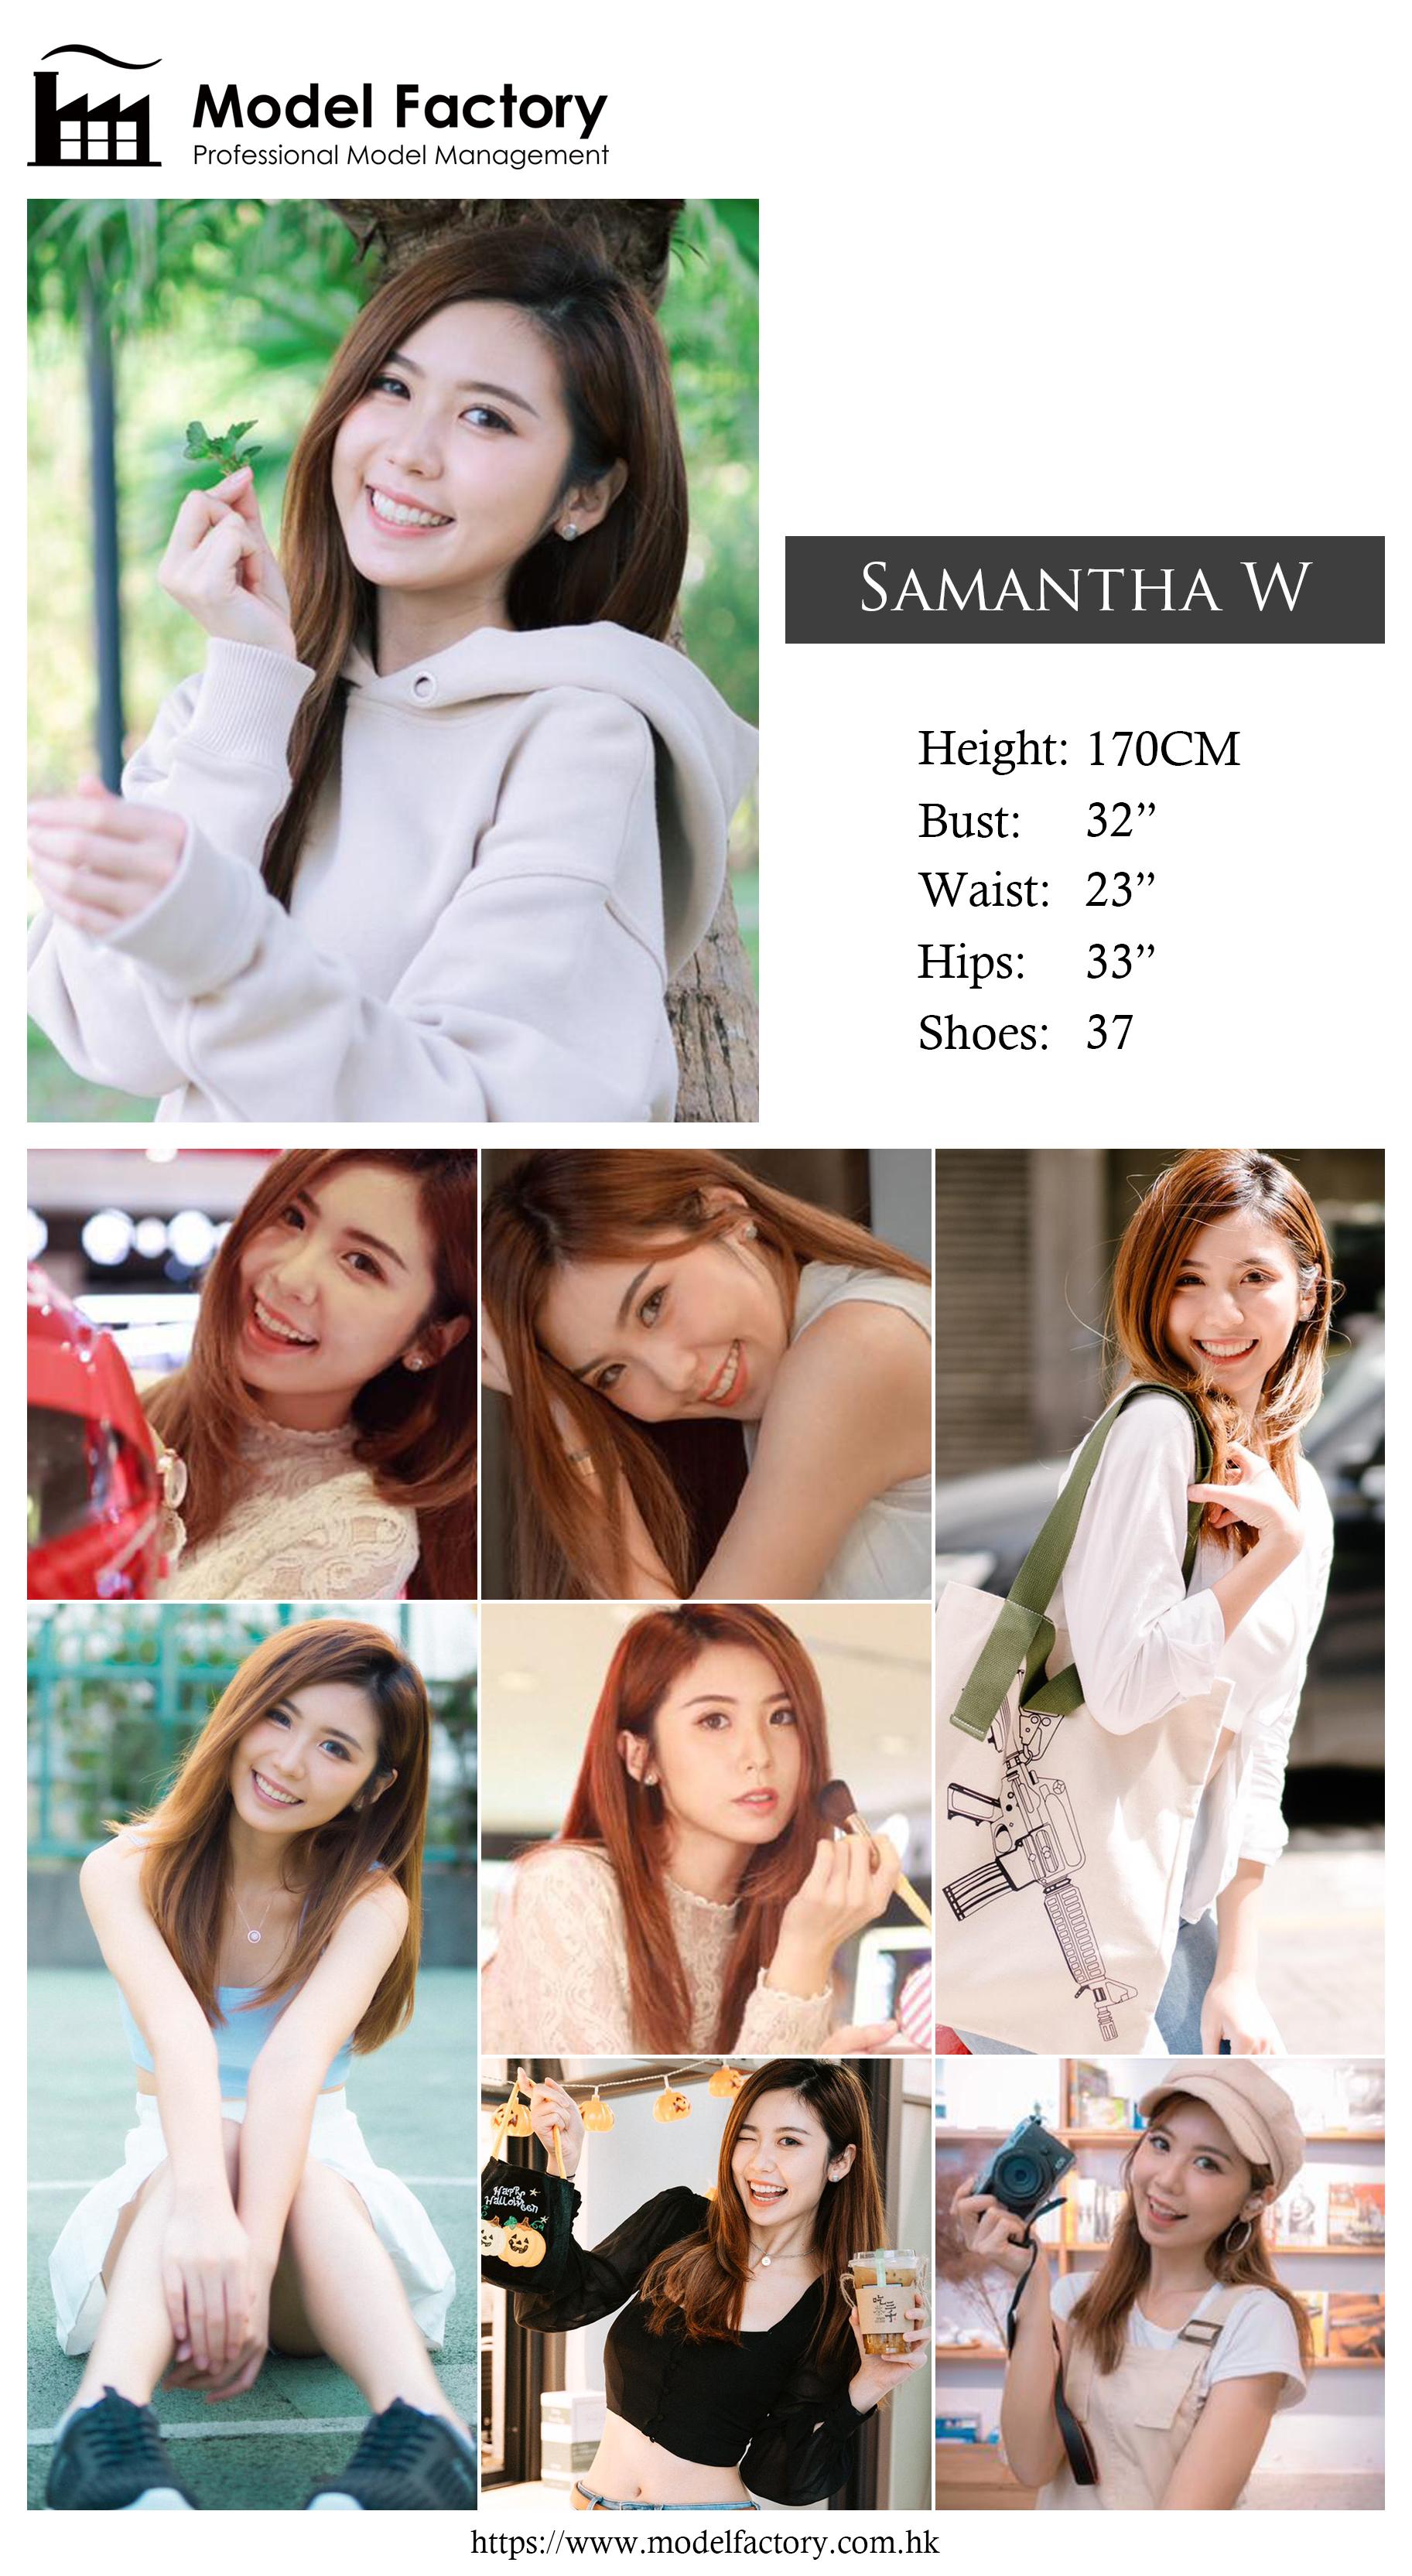 model agency hk Samantha W